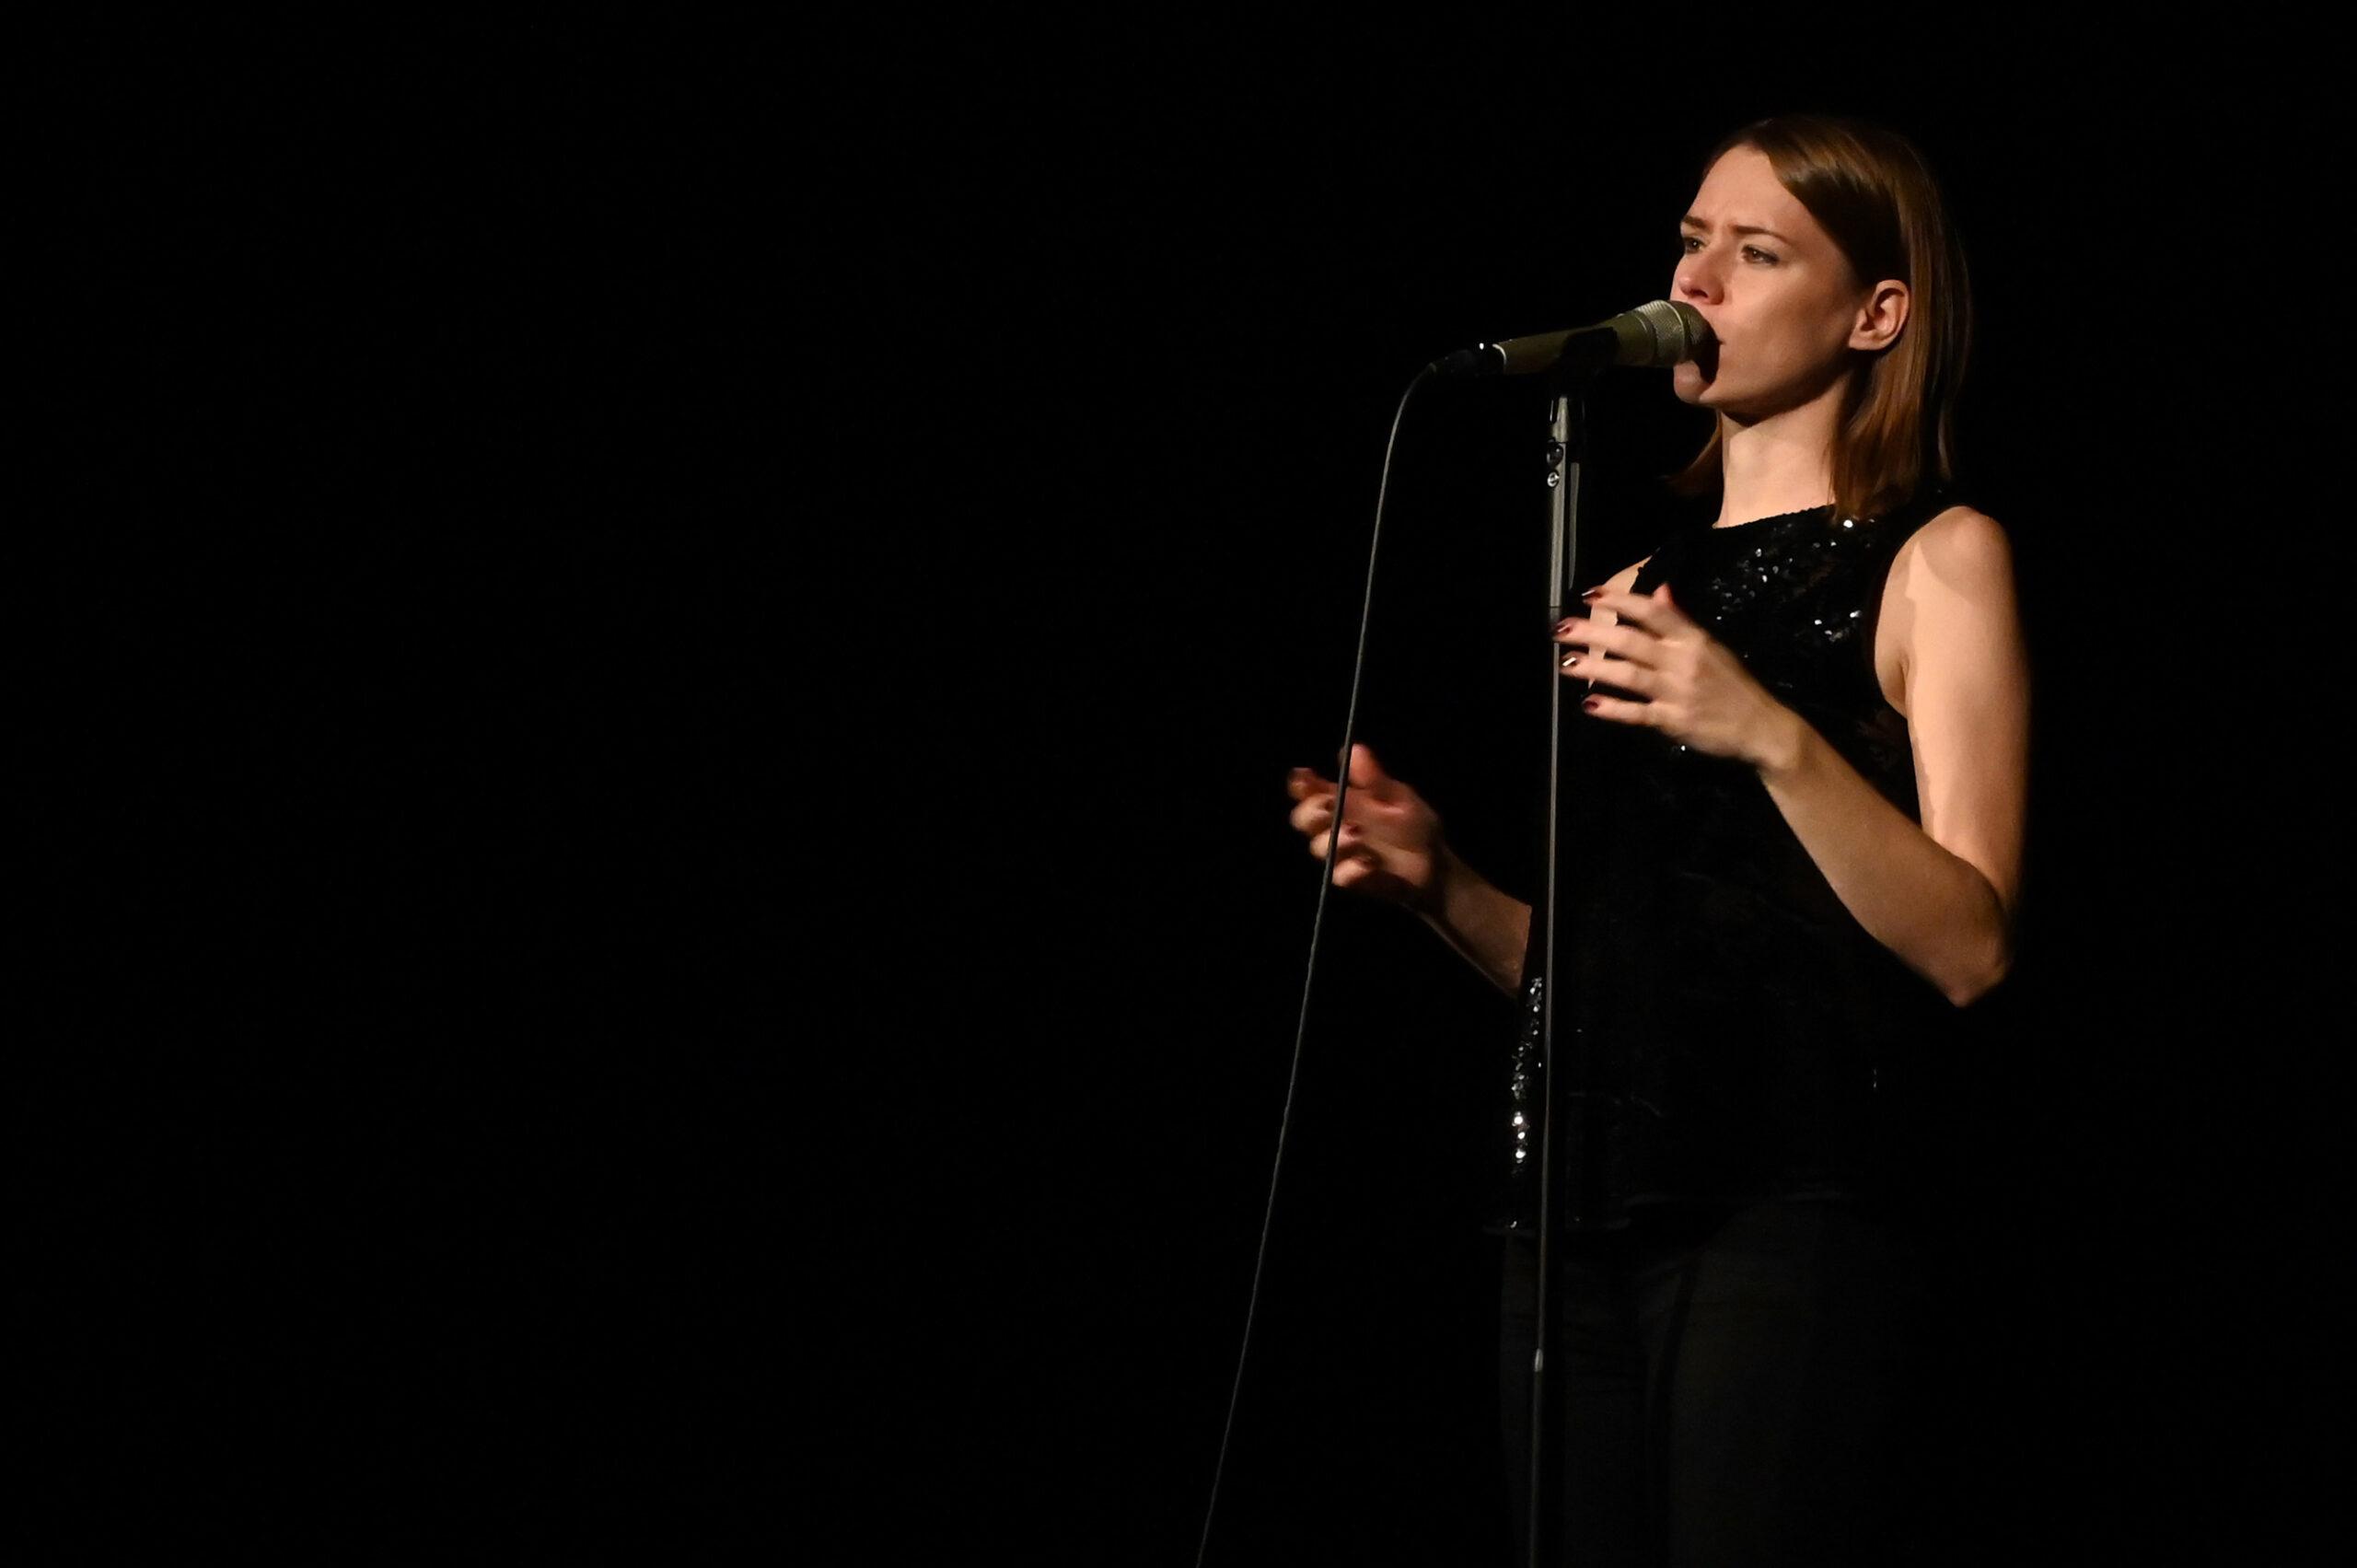 Romy Graske, Sängerin